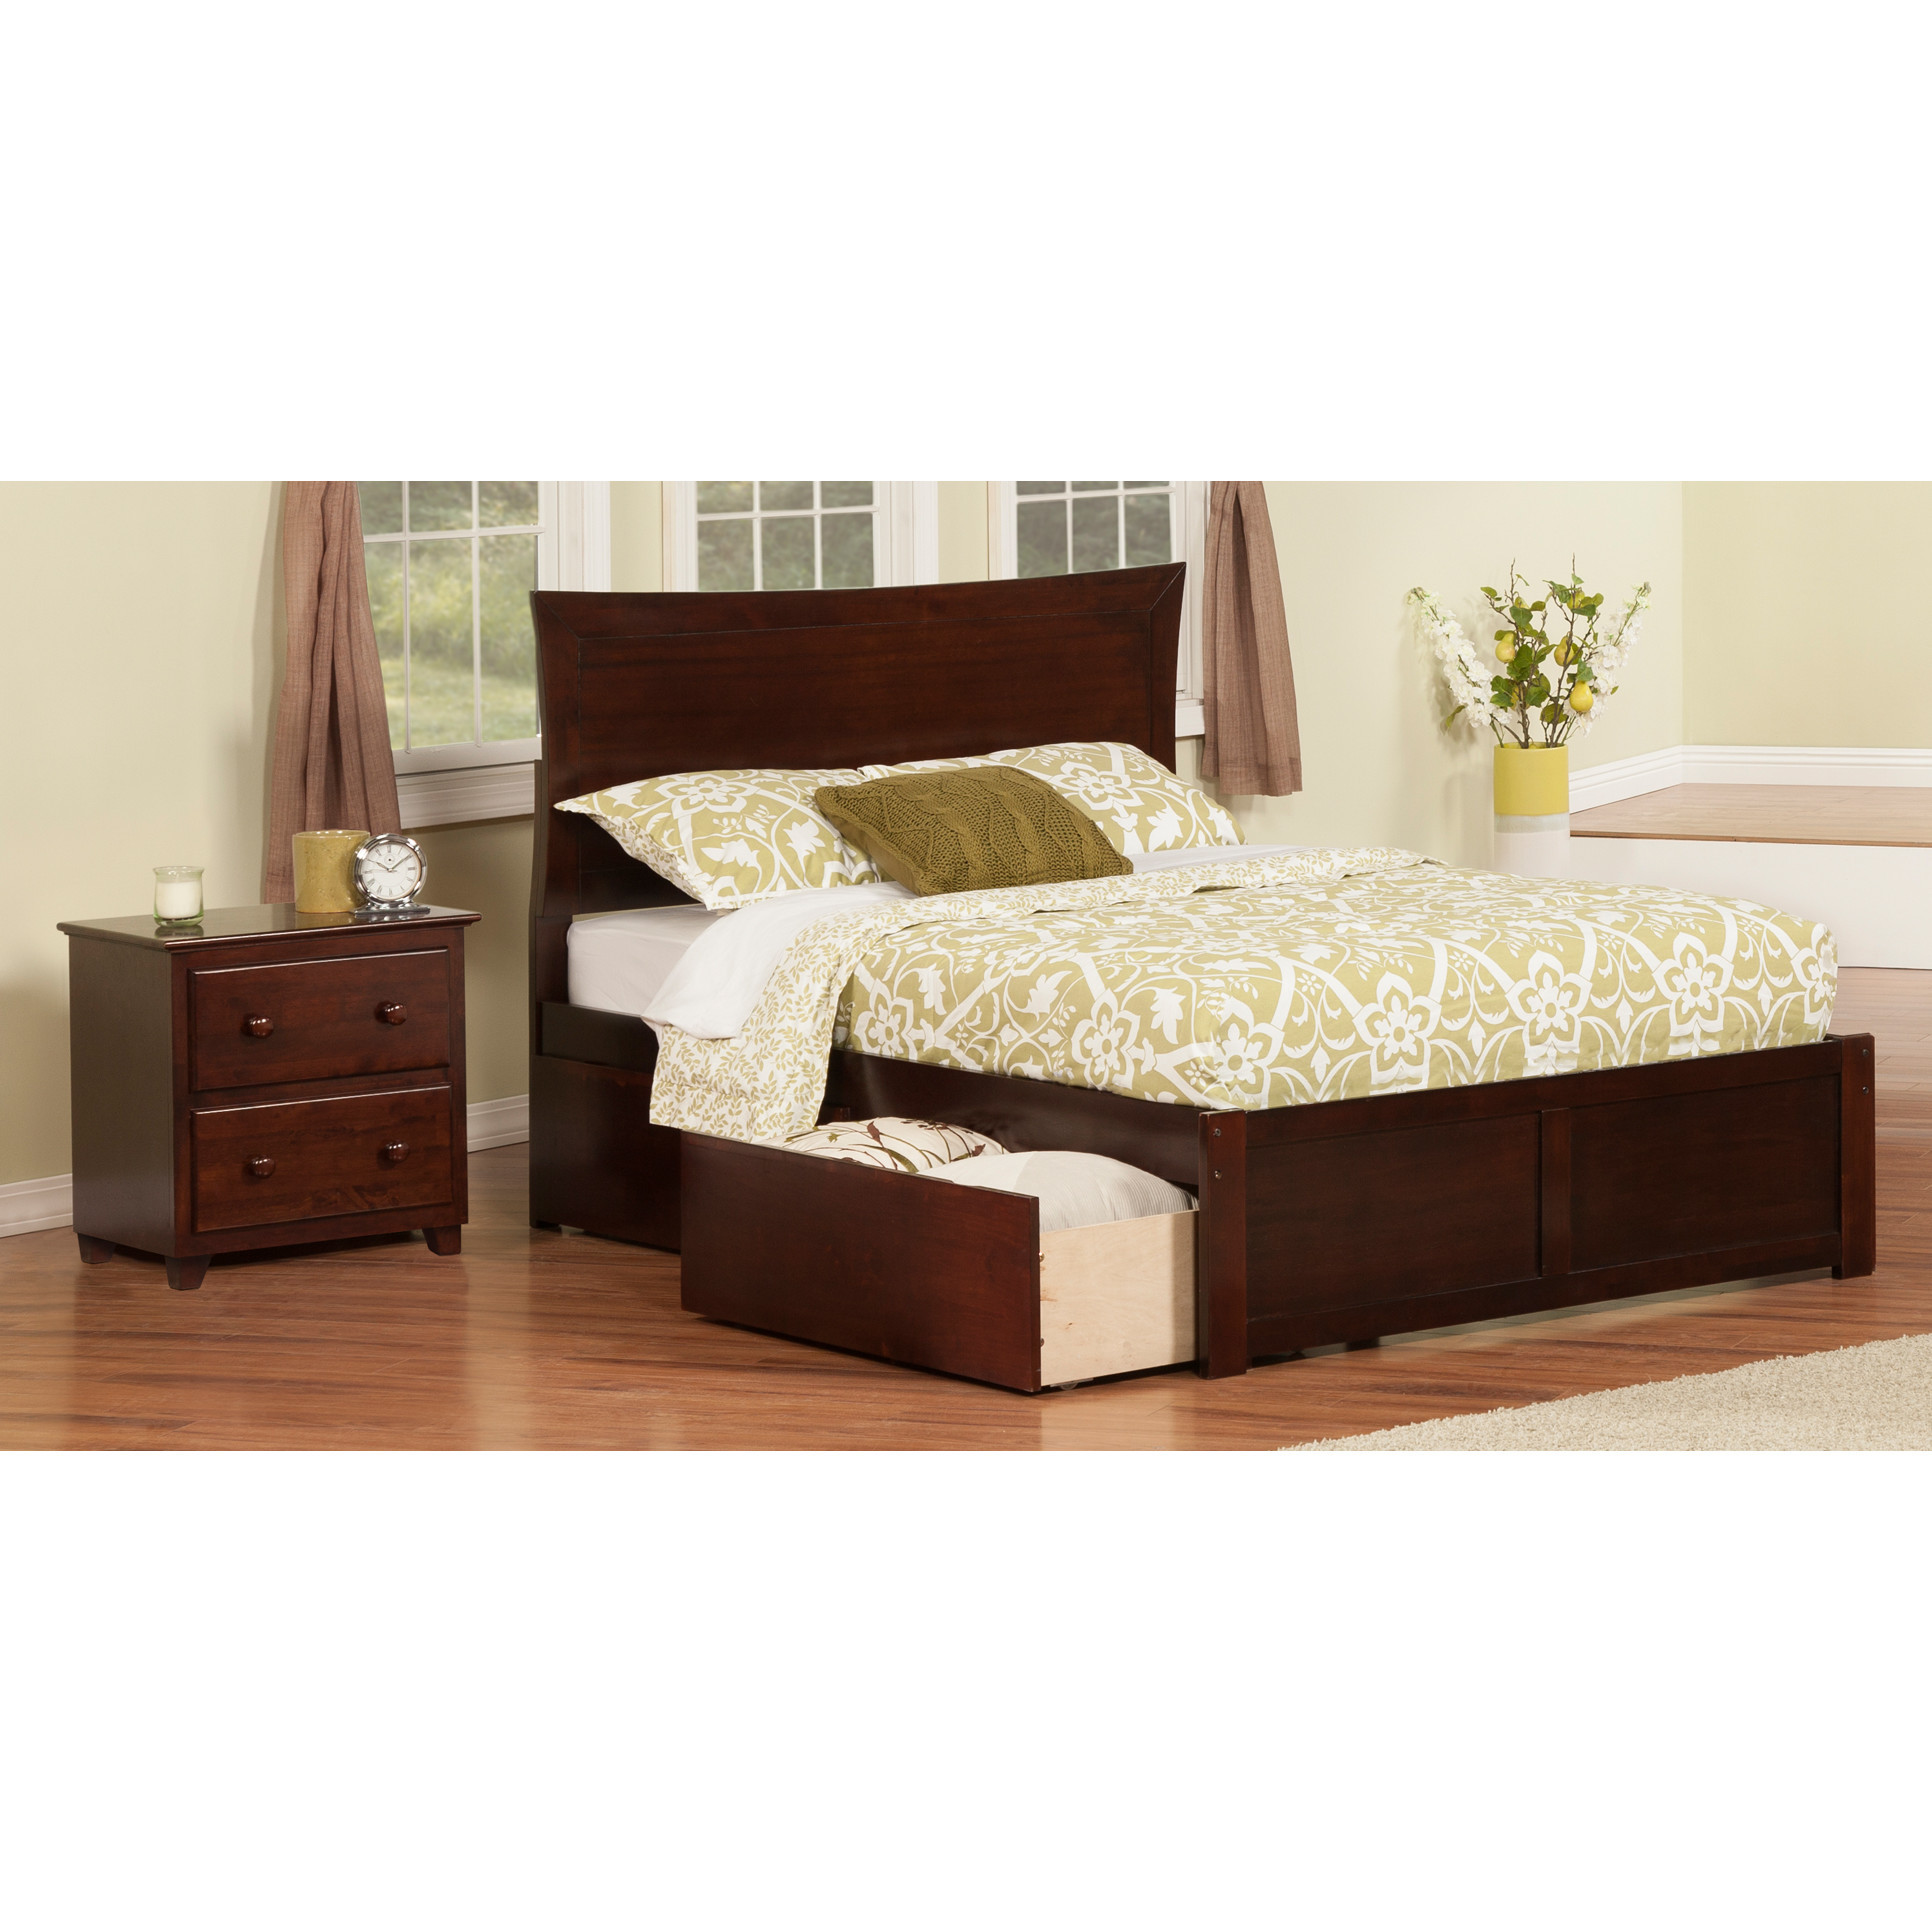 Best ideas about Wayfair Bedroom Sets . Save or Pin Viv Rae Egon Panel 2 Piece Bedroom Set & Reviews Now.